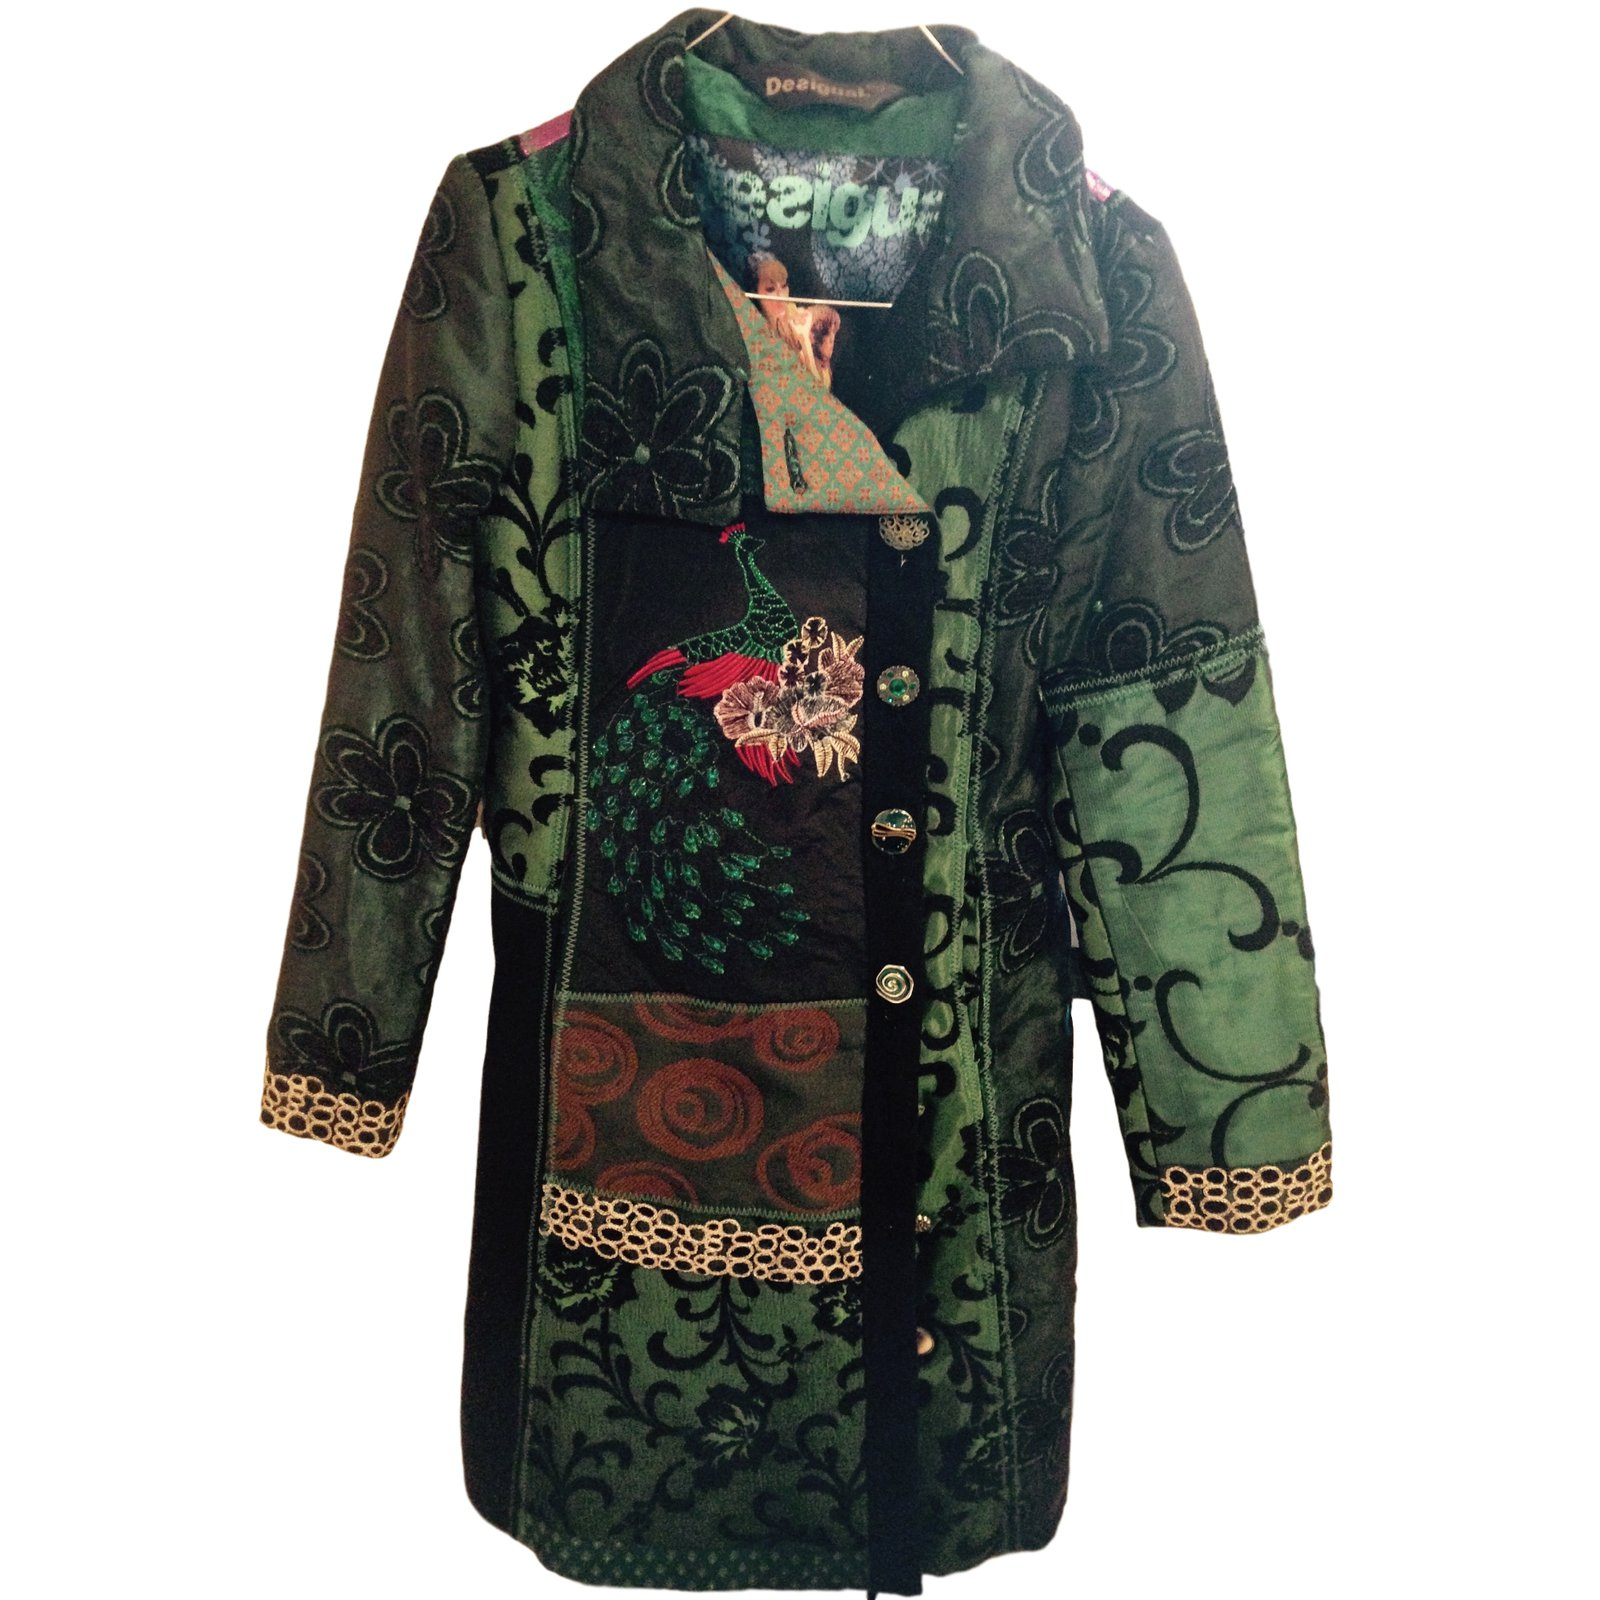 manteaux desigual manteau neuf laine vert joli. Black Bedroom Furniture Sets. Home Design Ideas